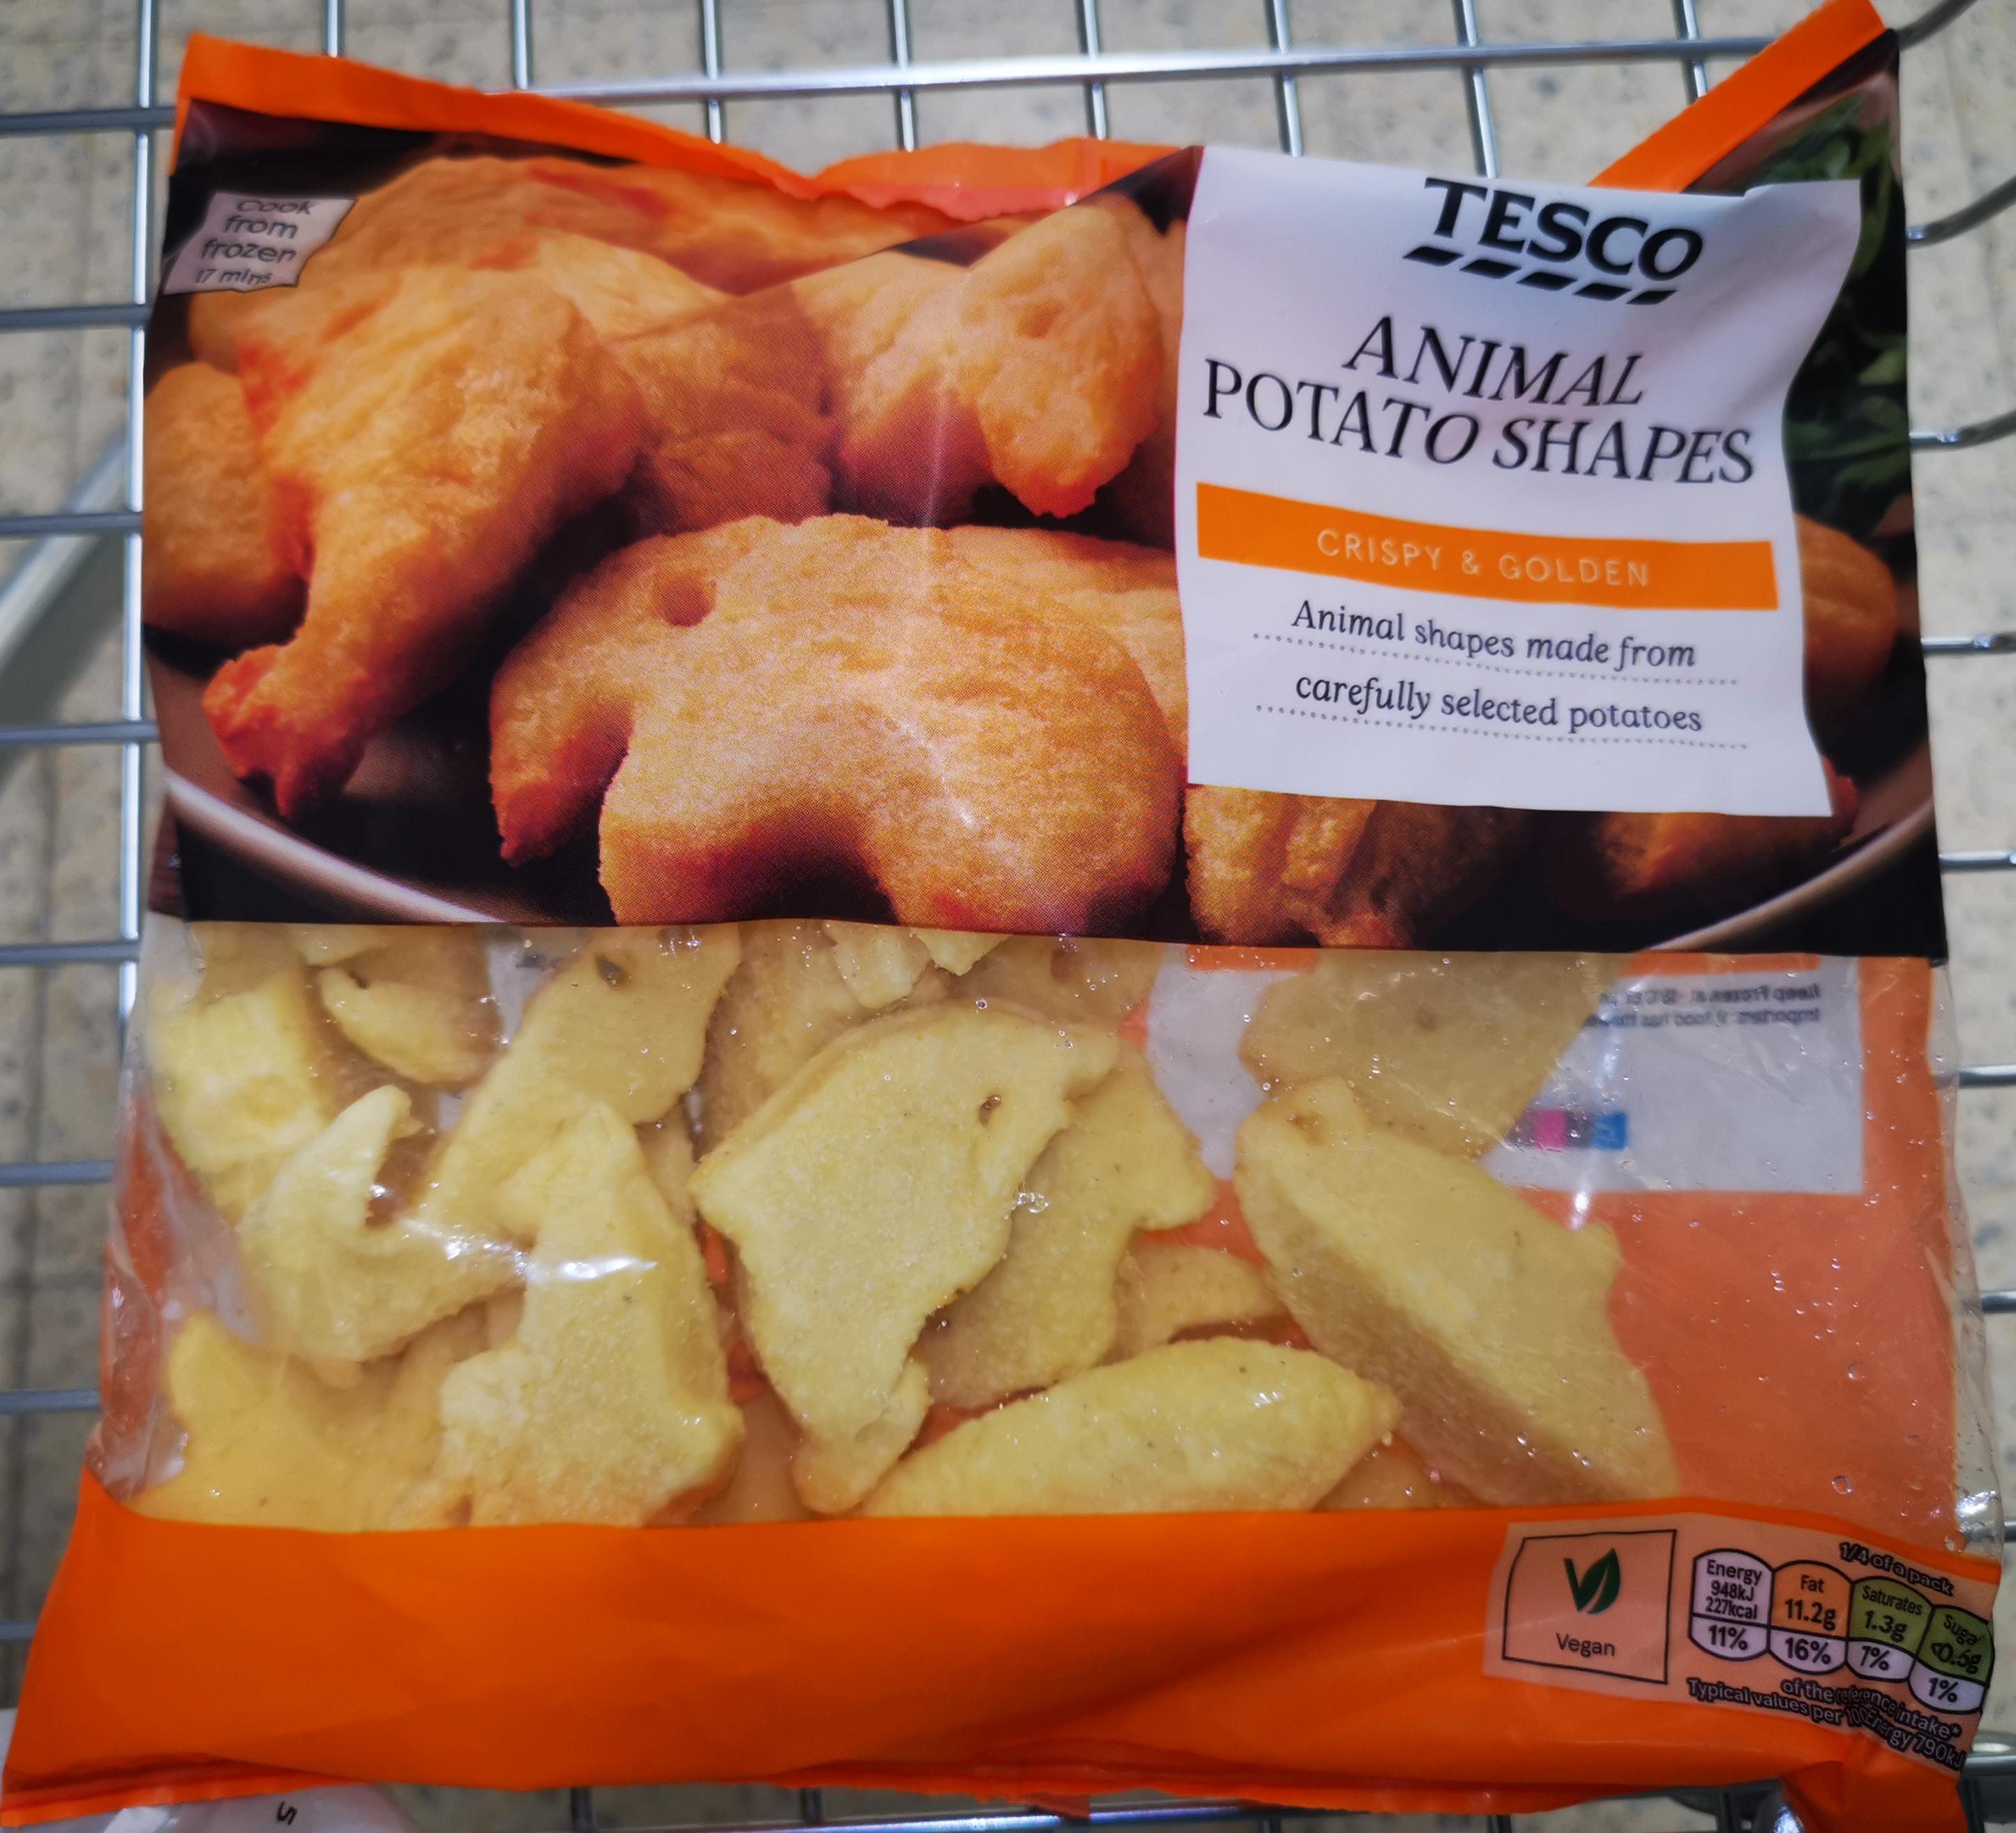 Animal Potato Shapes 500g, 25p Reduced To Clear @ Tesco Metro St Enoch, Glasgow